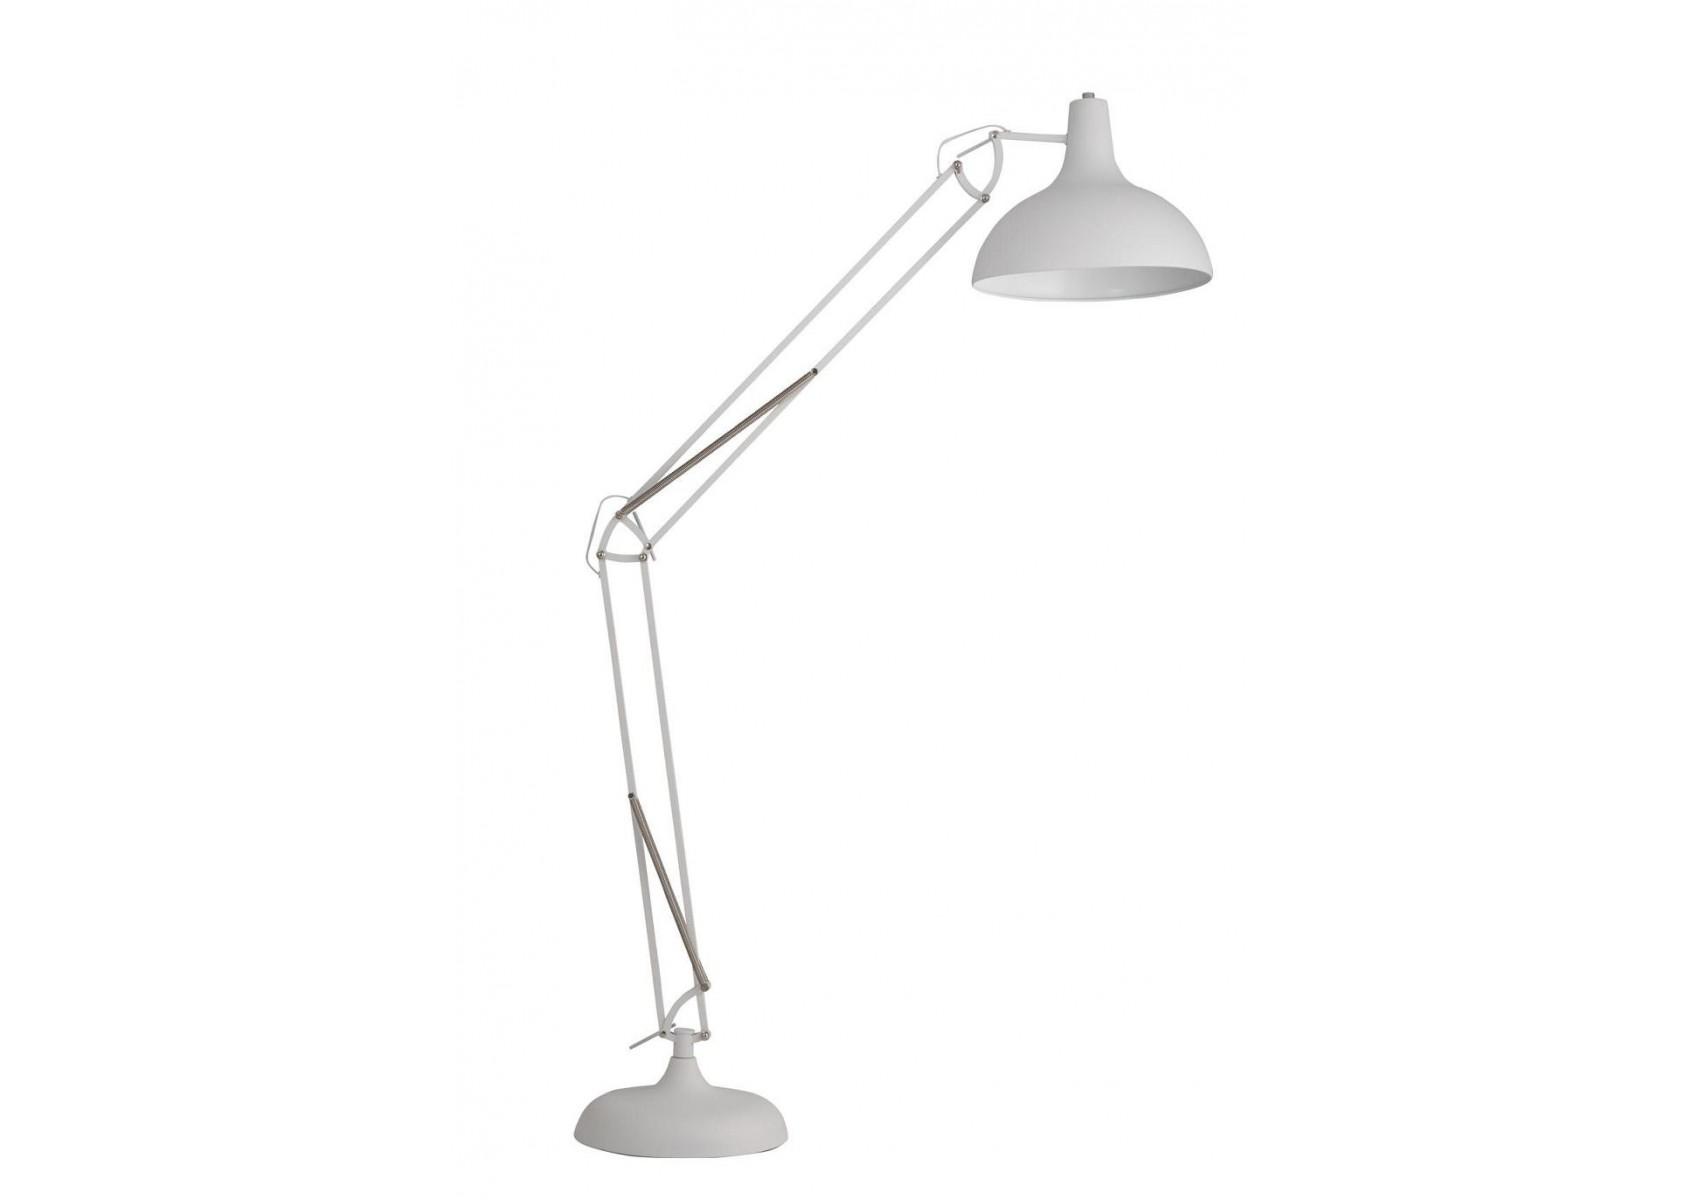 lampadaire design look industriel articul xxl office. Black Bedroom Furniture Sets. Home Design Ideas